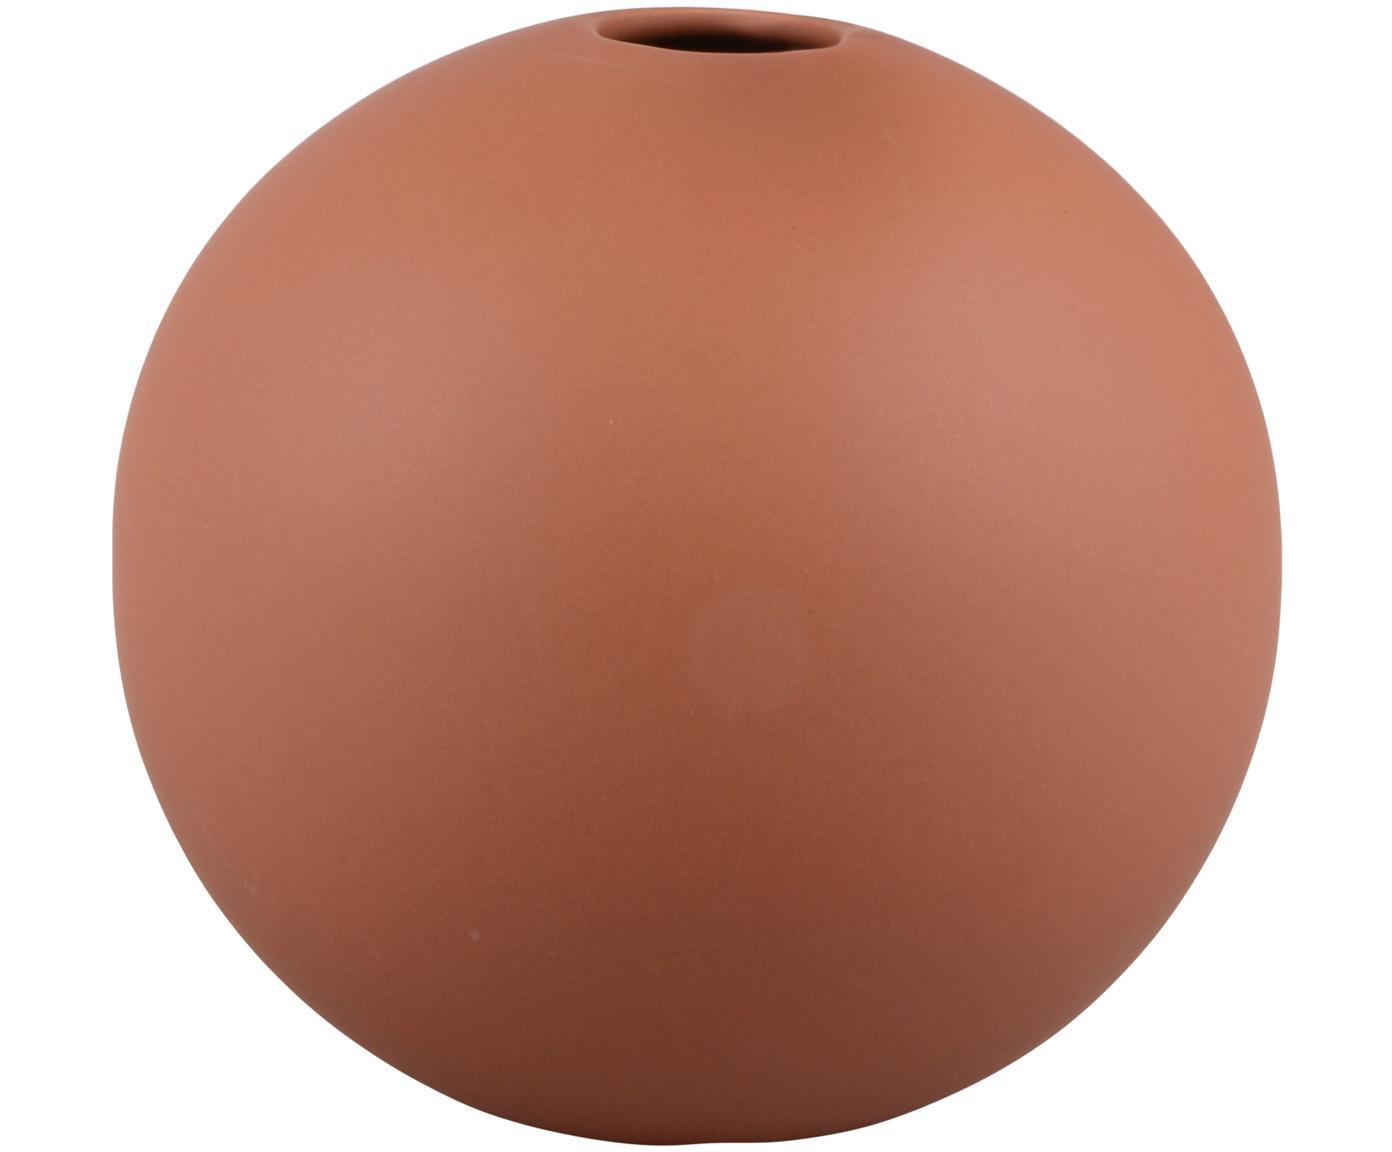 Kugel-Vase Rita aus Keramik, Keramik, Rot, Ø 12 x H 12 cm